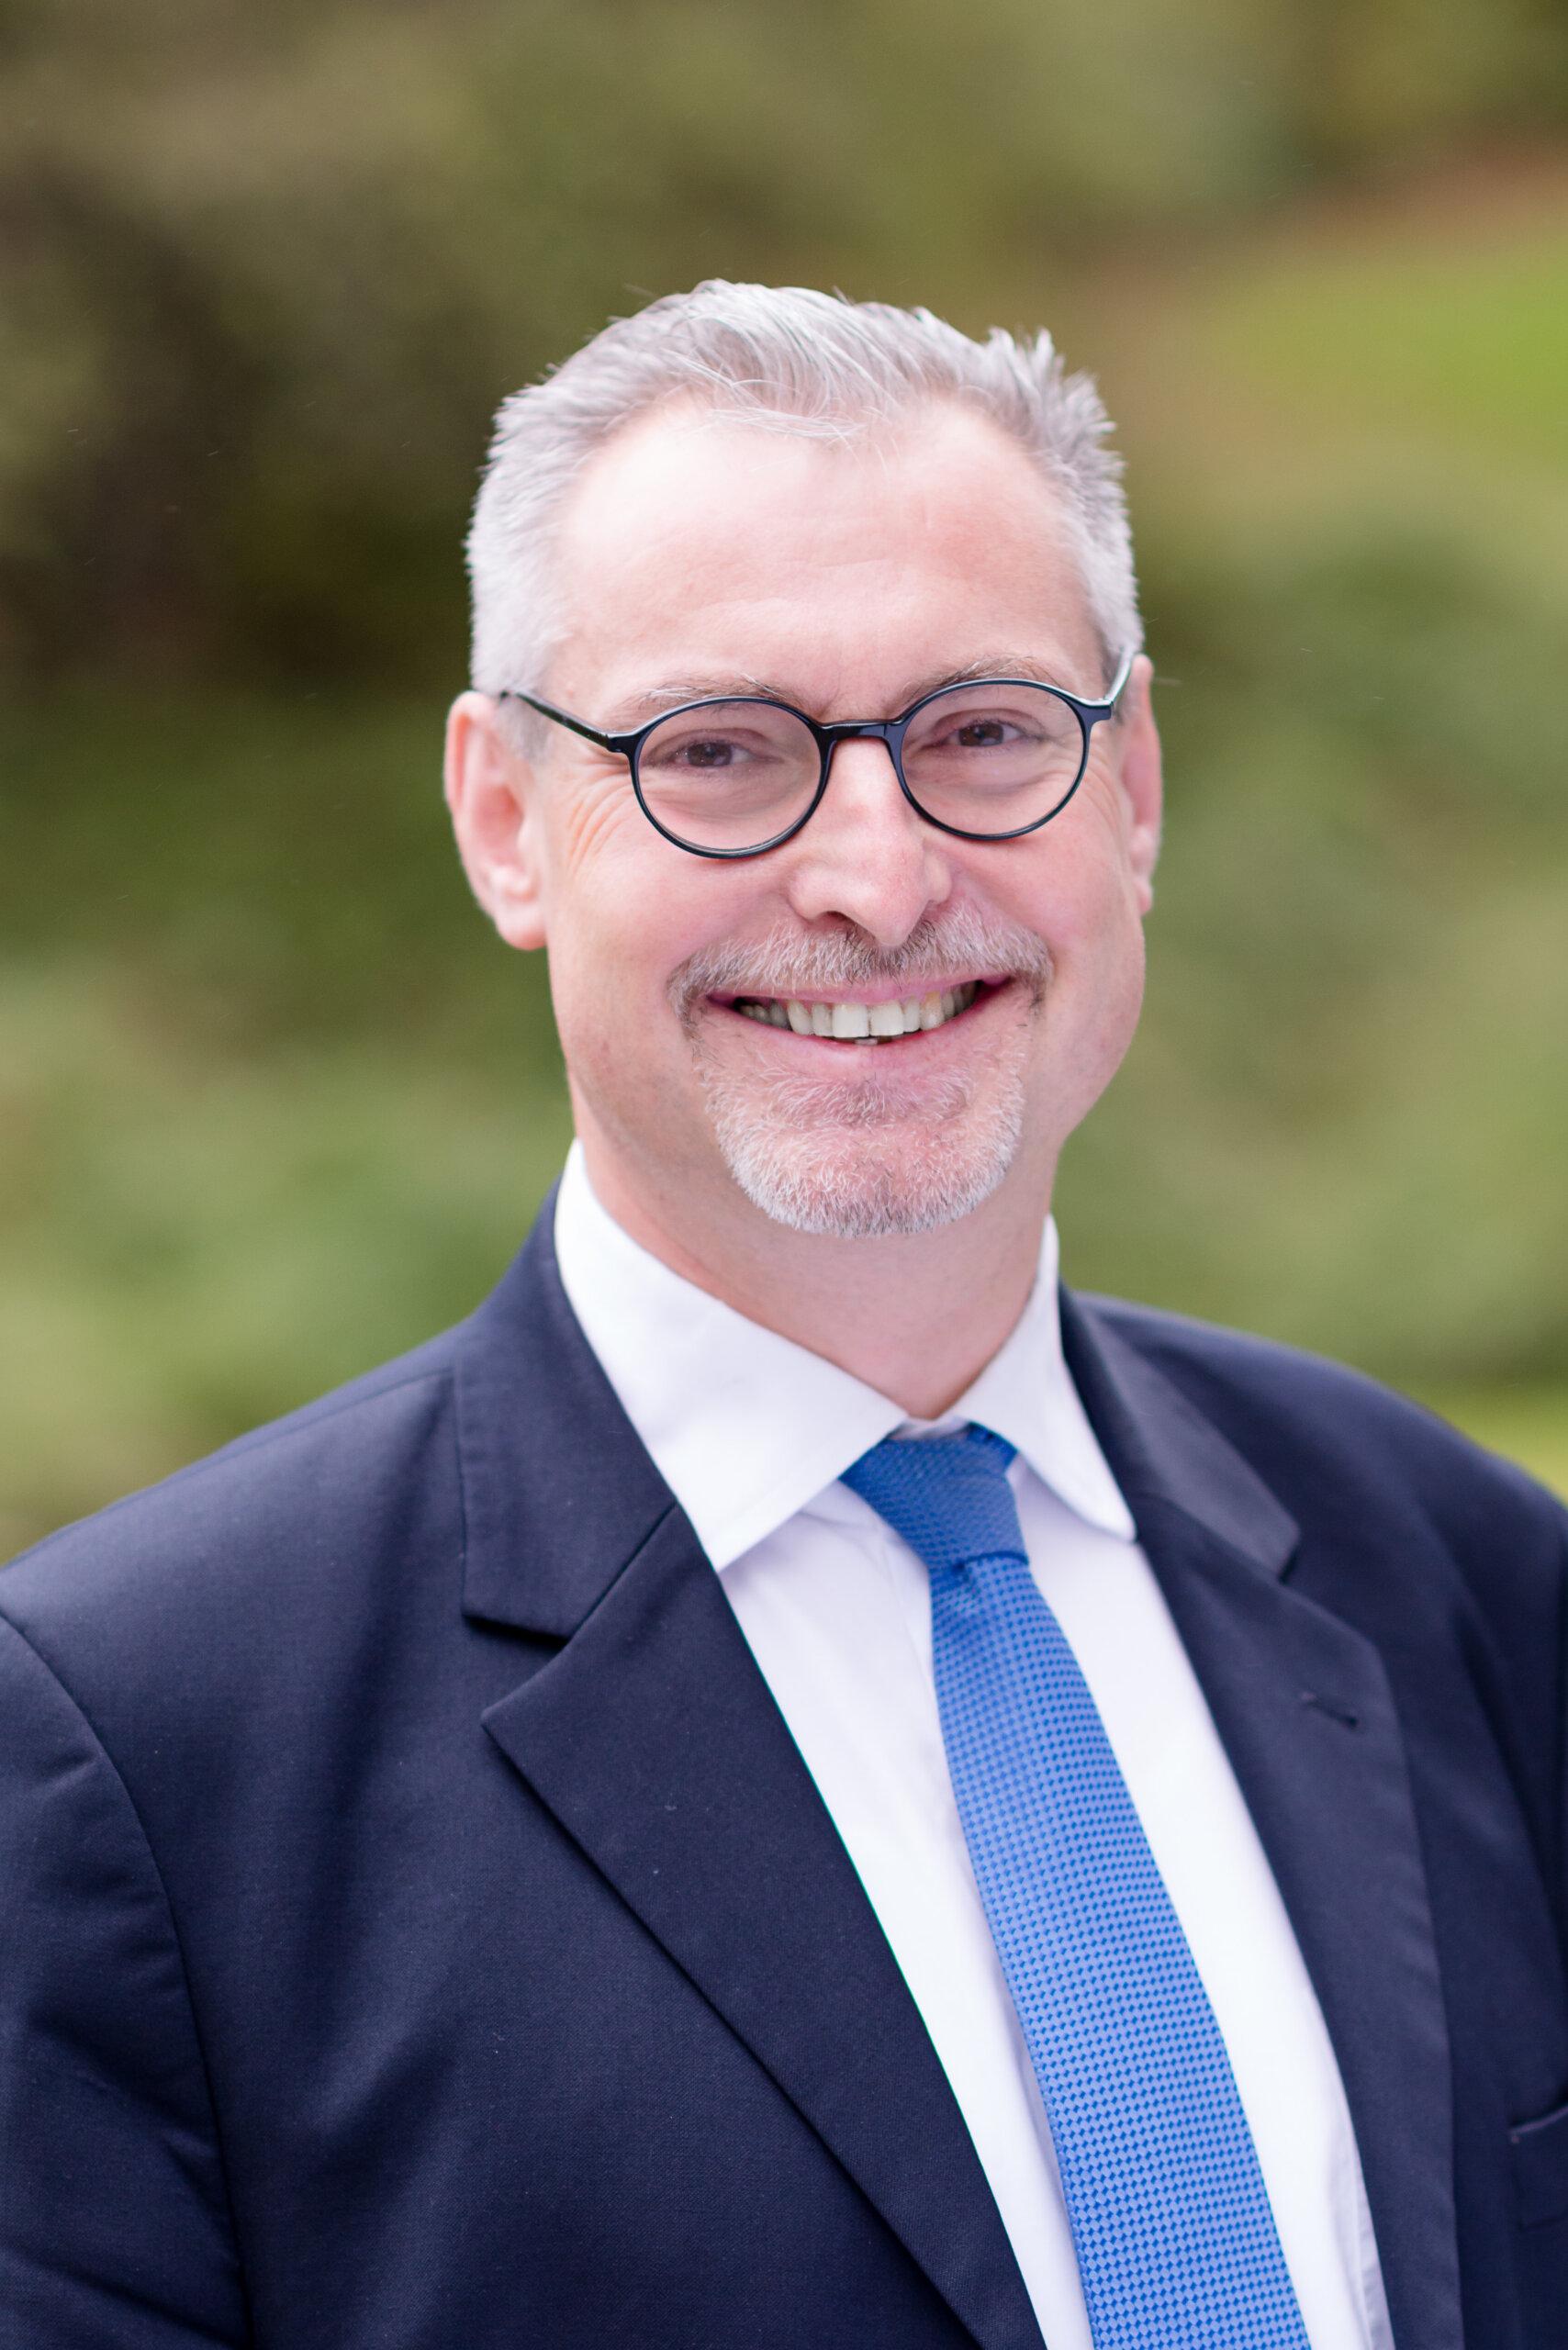 Andreas Hauer Profilbild